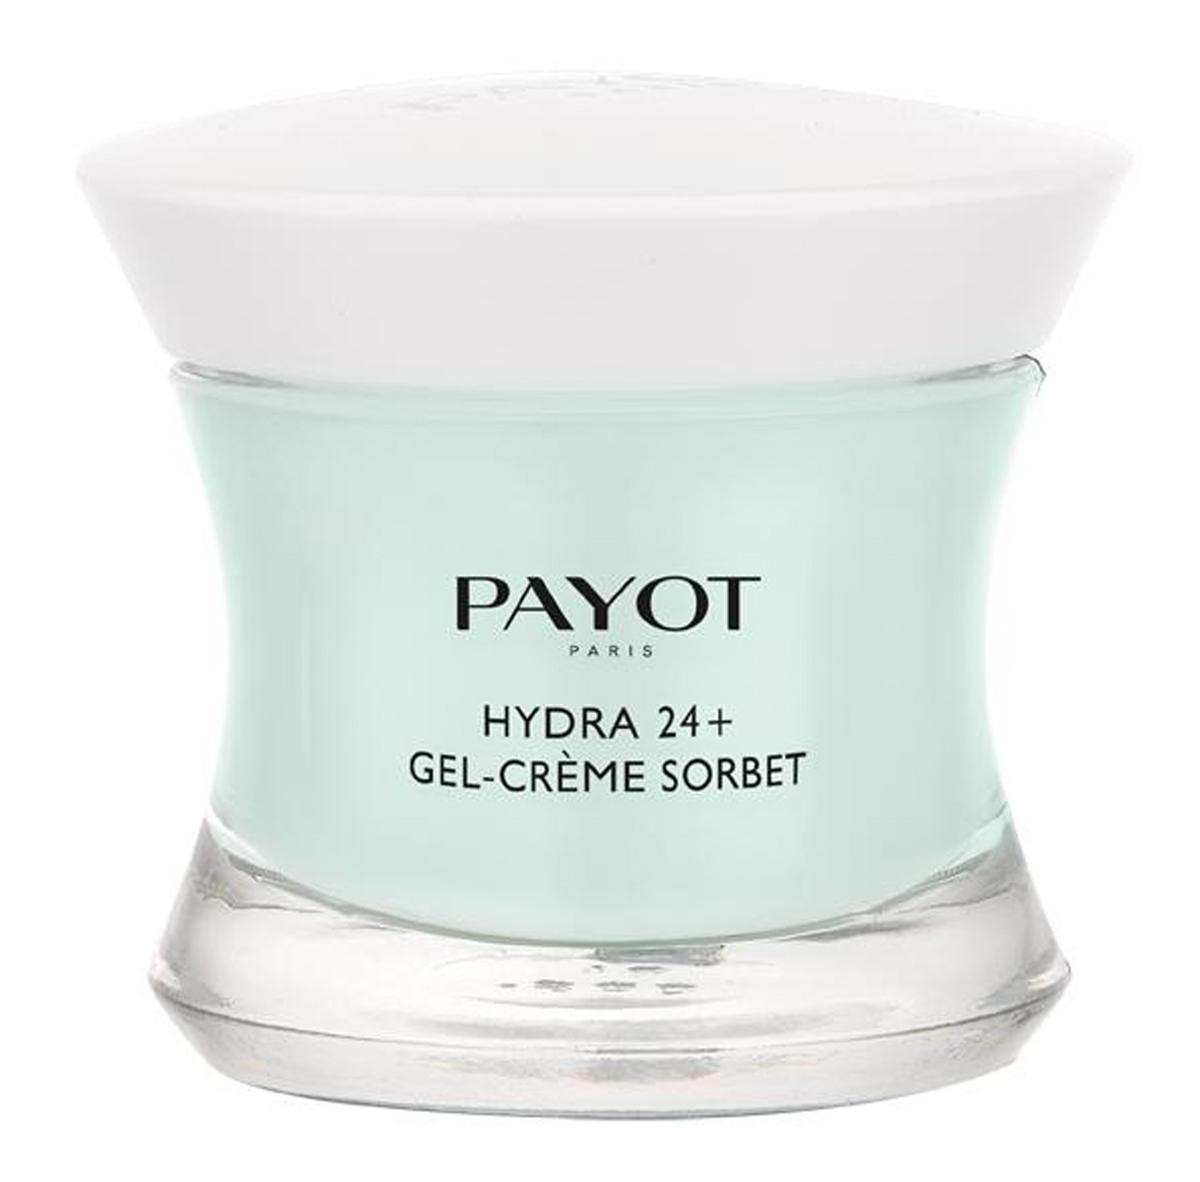 Payot Hydra 24+ Увлажняющий крем-гель, возвращающий контур коже, 50 мл бальзамы payot увлажняющий бальзам стик для губ payot hydra 24 4 мл